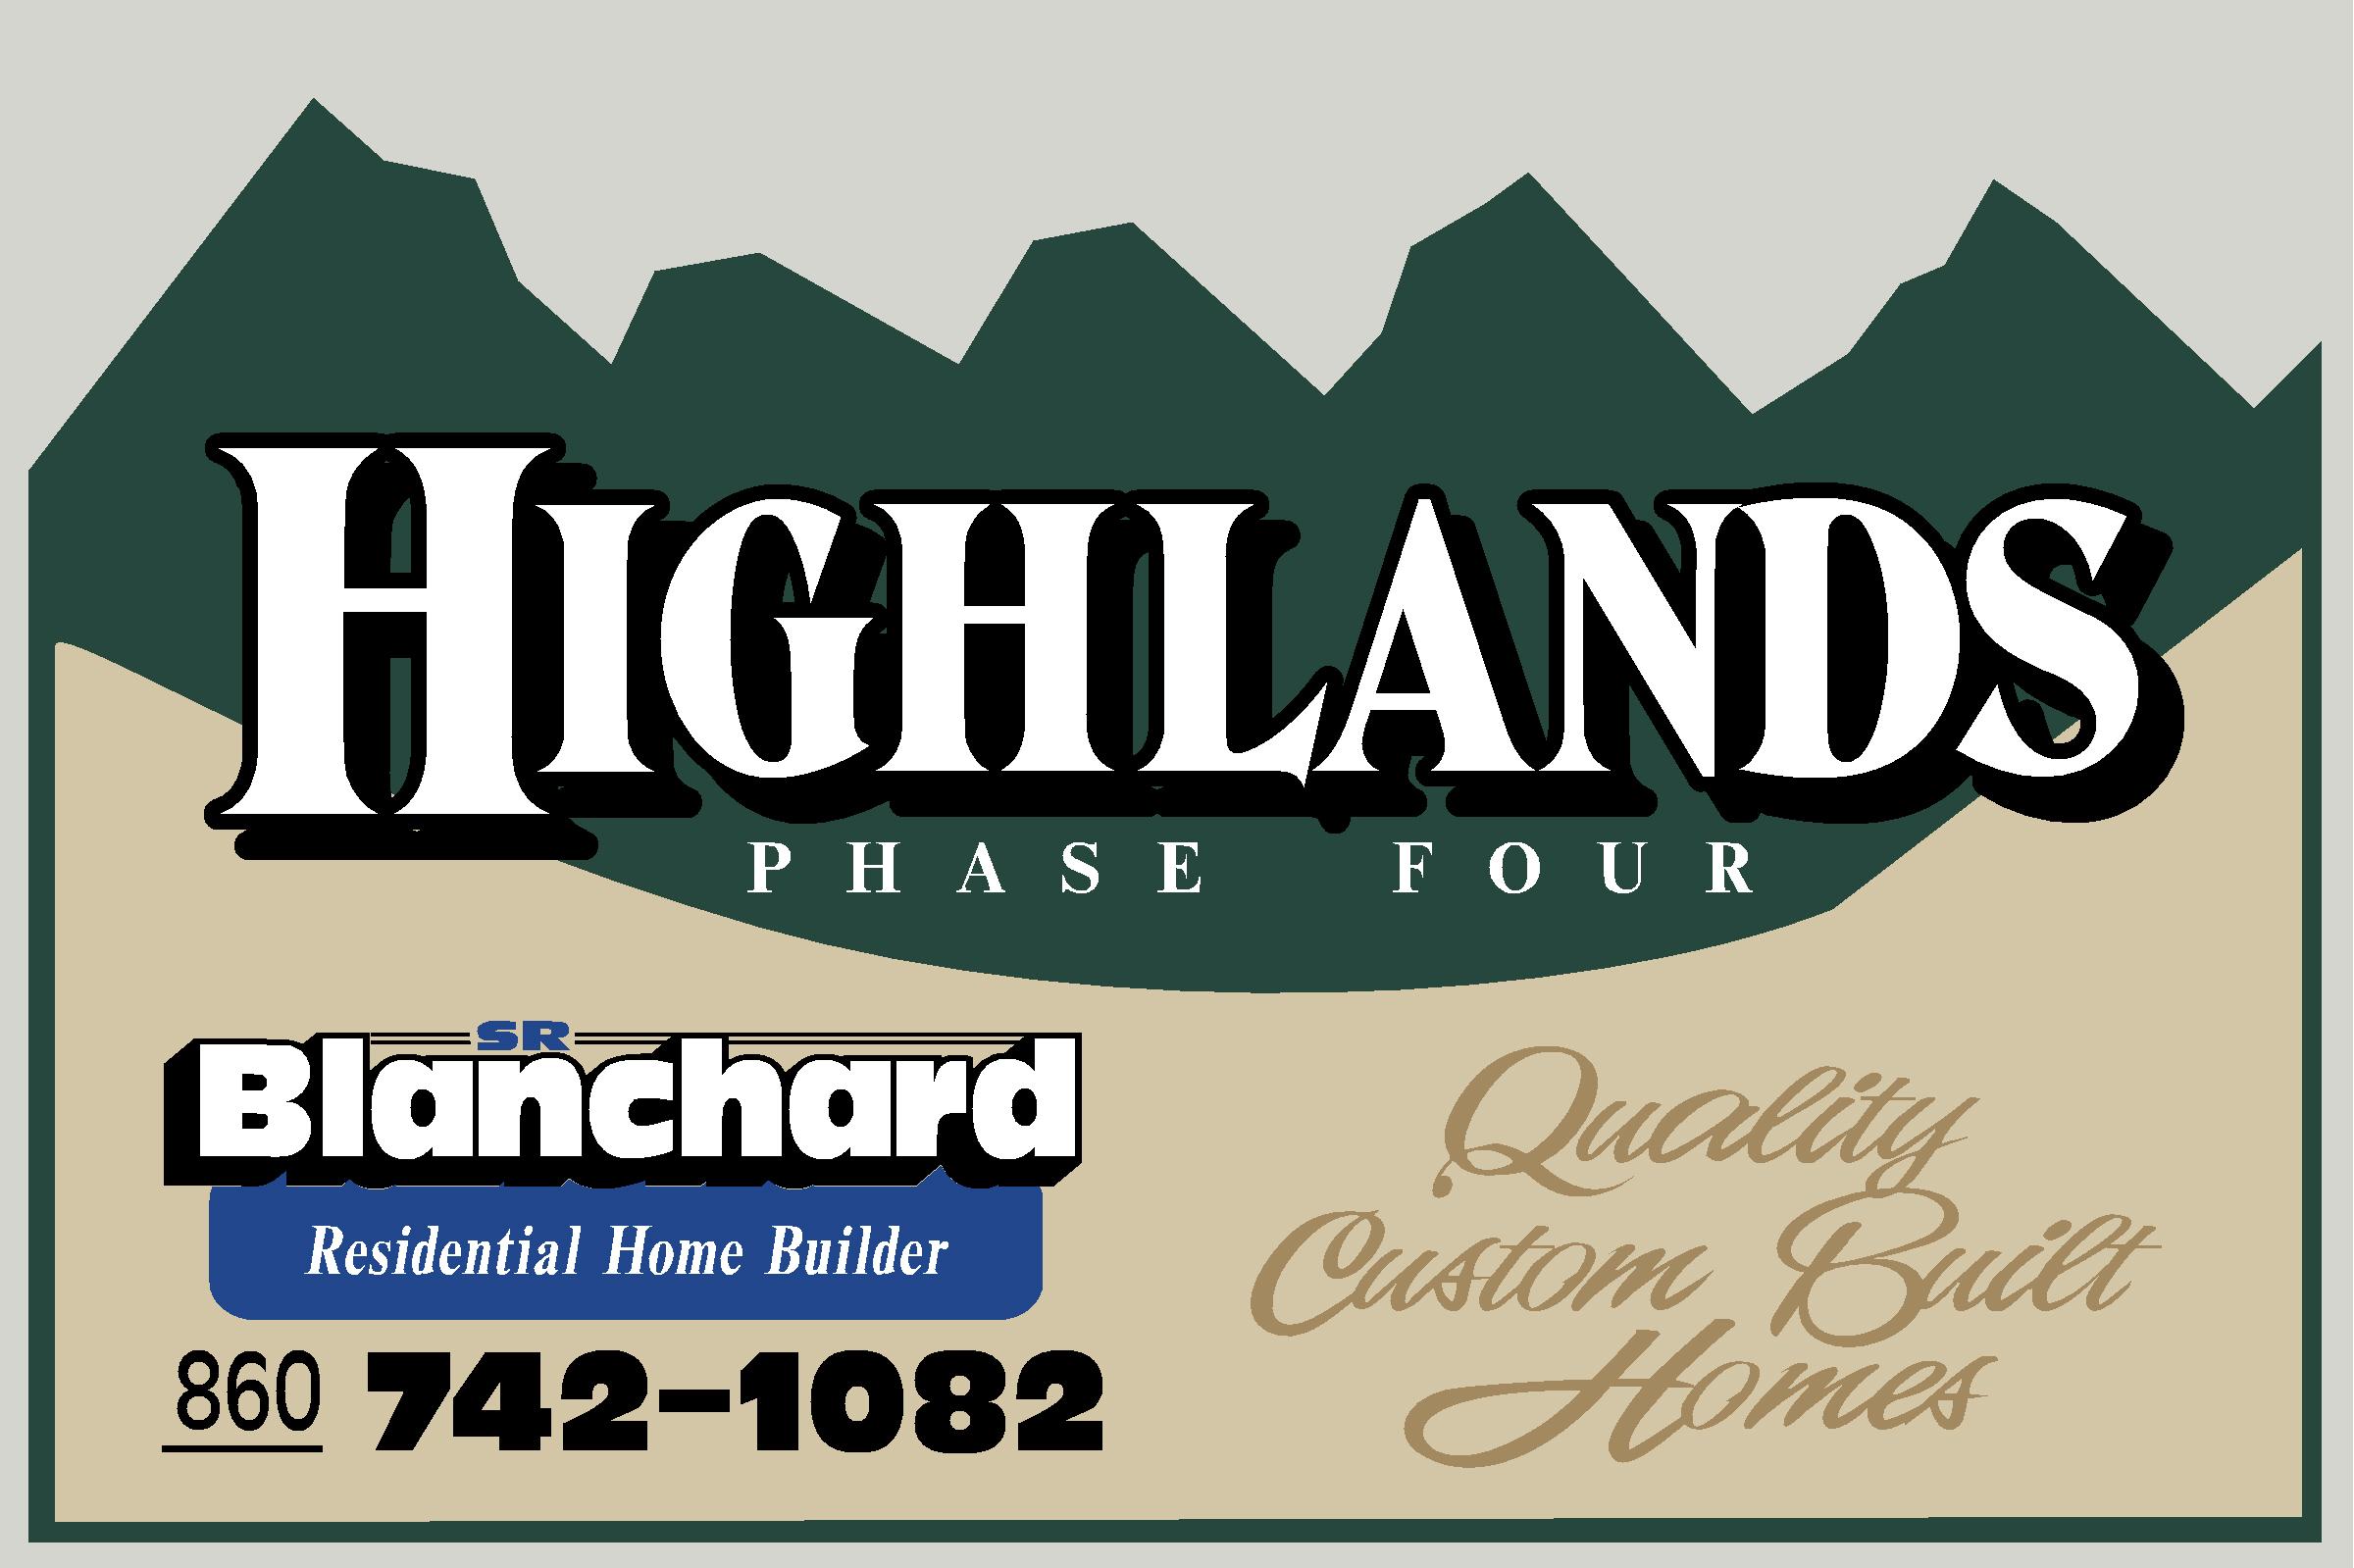 BlanchardHighlands.JPG